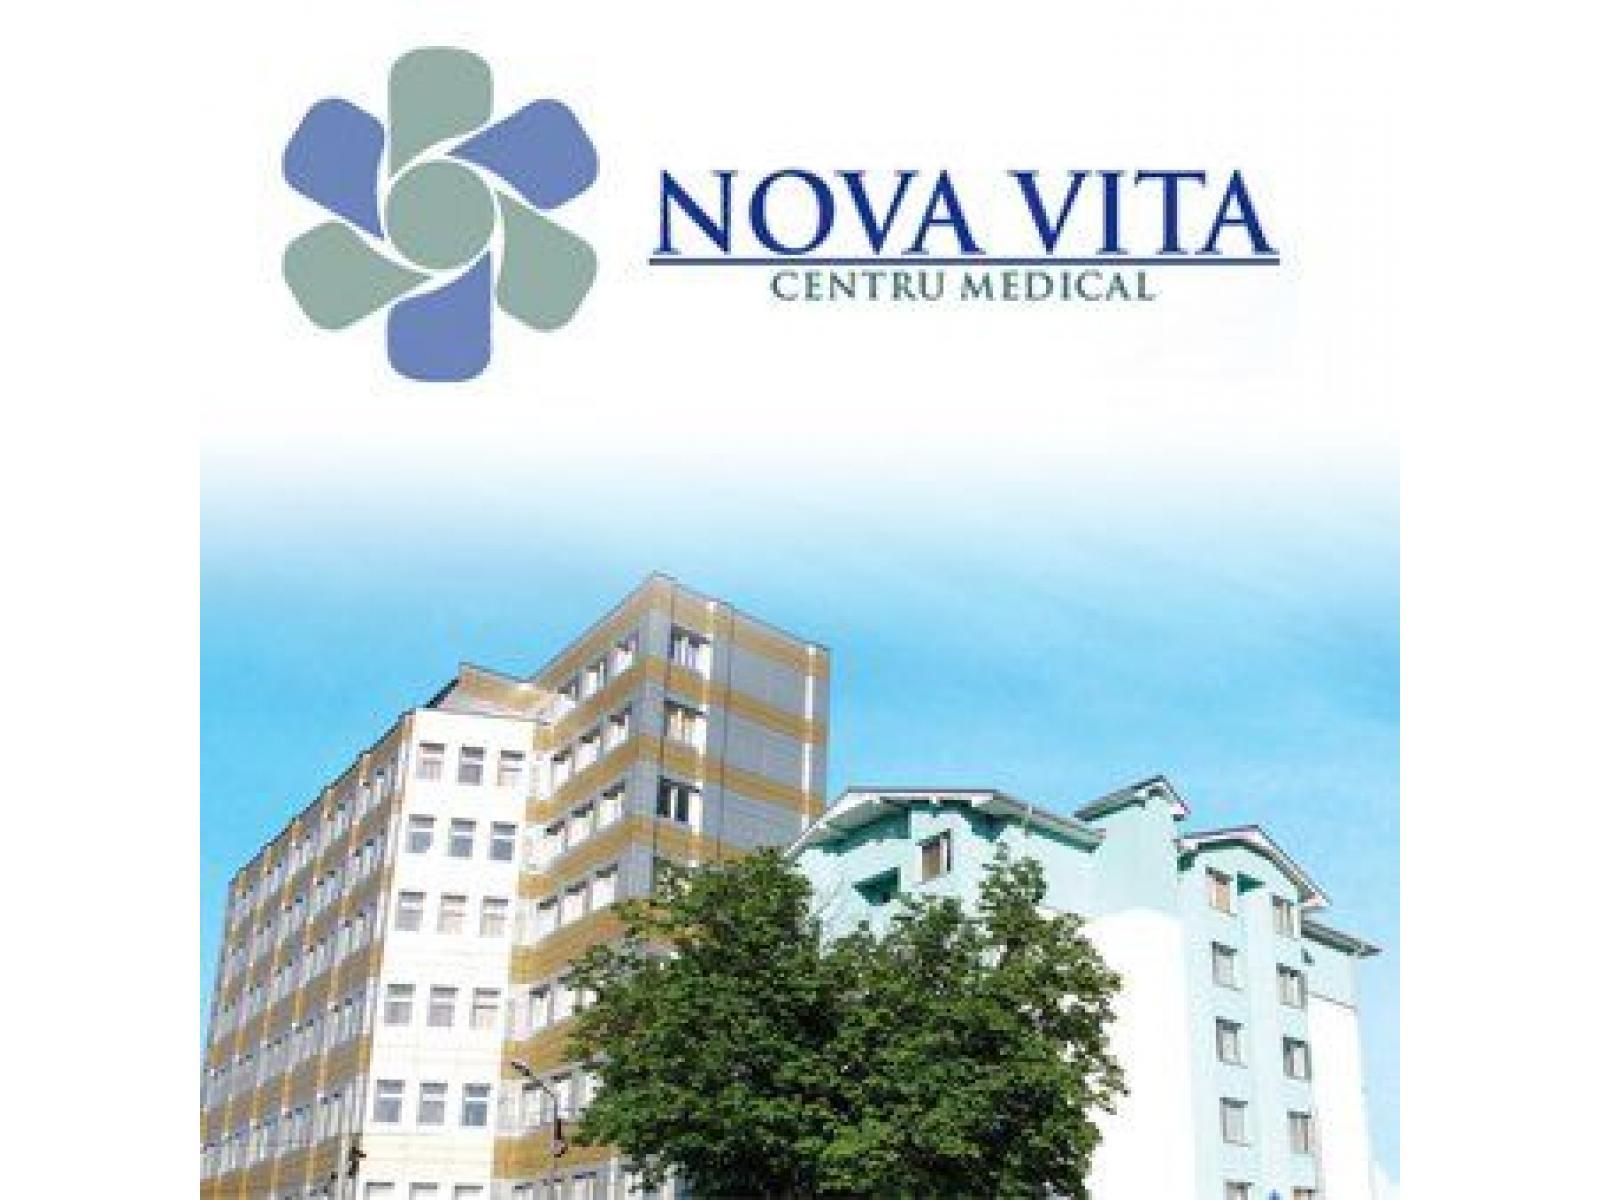 Centrul Medical NOVA VITA - 188558_193754590646097_4034558_n.jpg